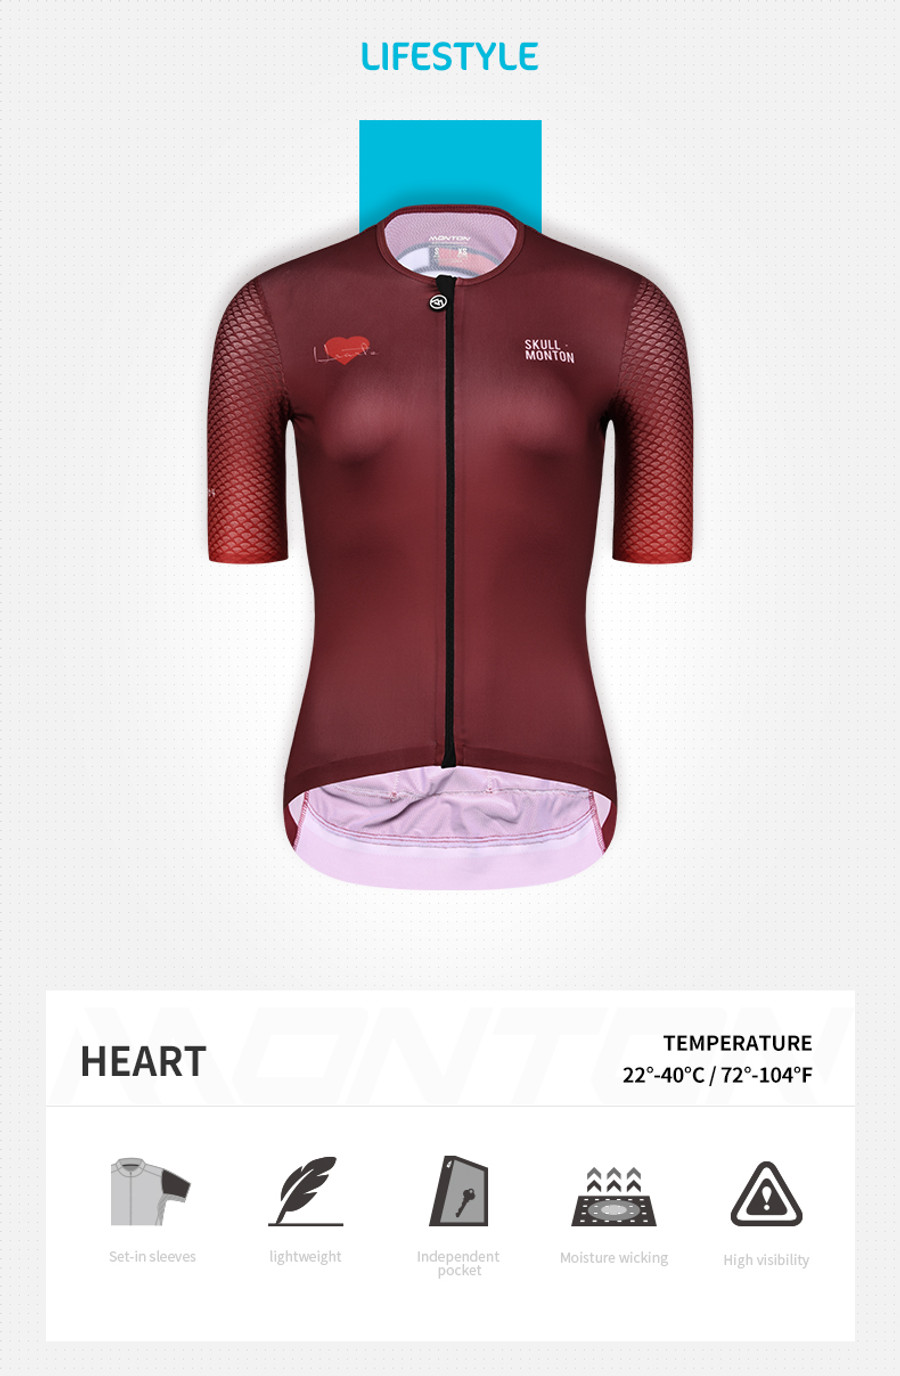 Women's Lifestyle Hearts Jersey